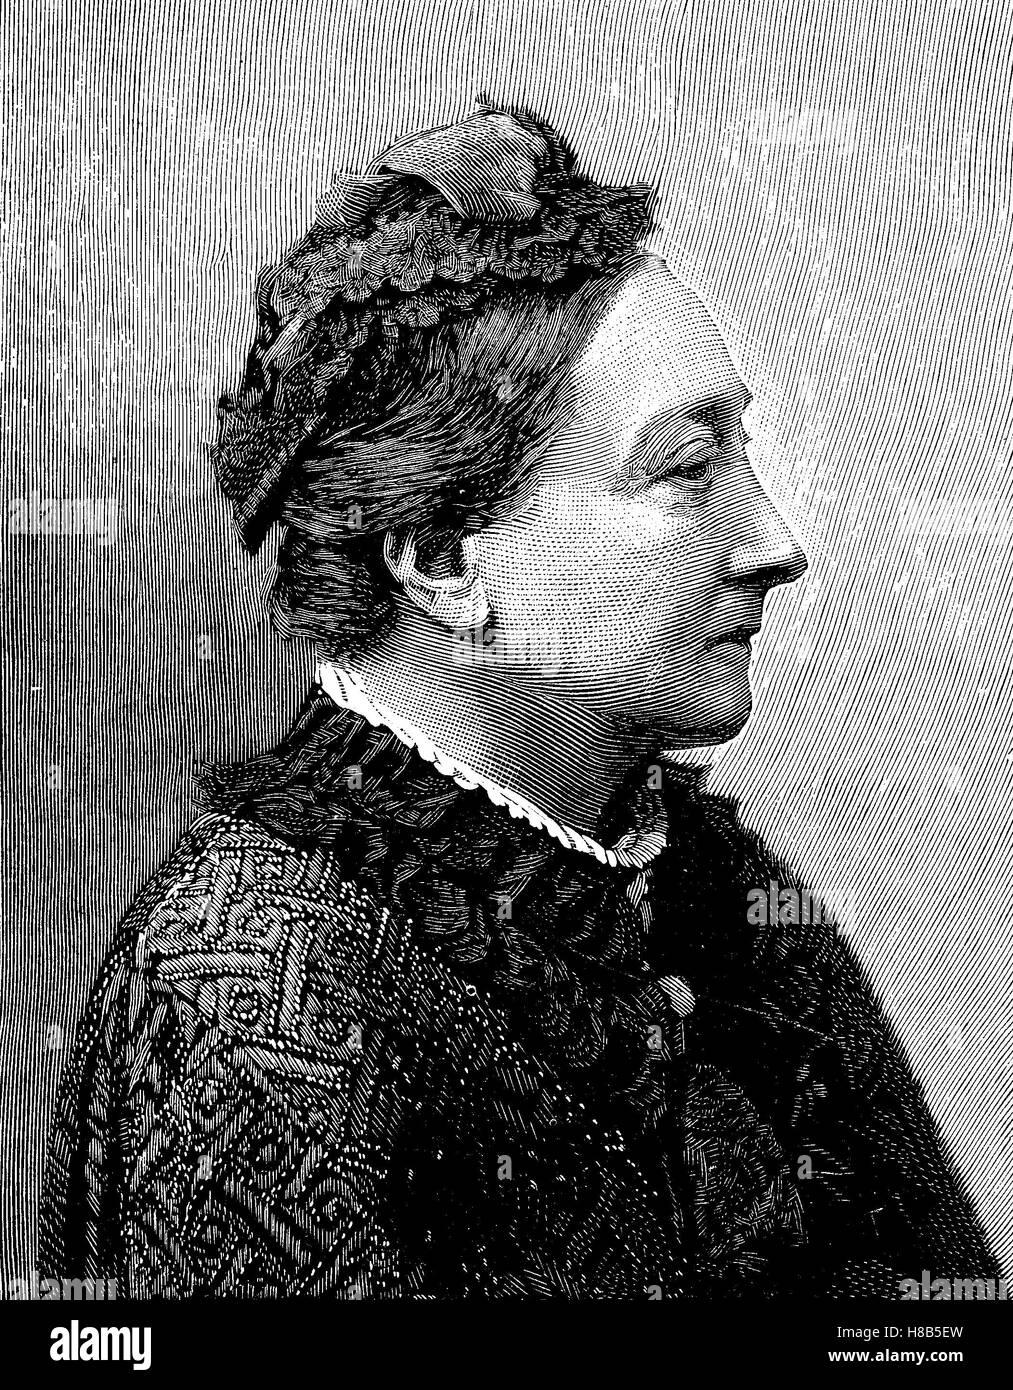 La princesa Luisa de Sax-Gotha-Altenburg, Louise Dorothea Pauline Charlotte Fredericka Auguste; 21 de diciembre Imagen De Stock